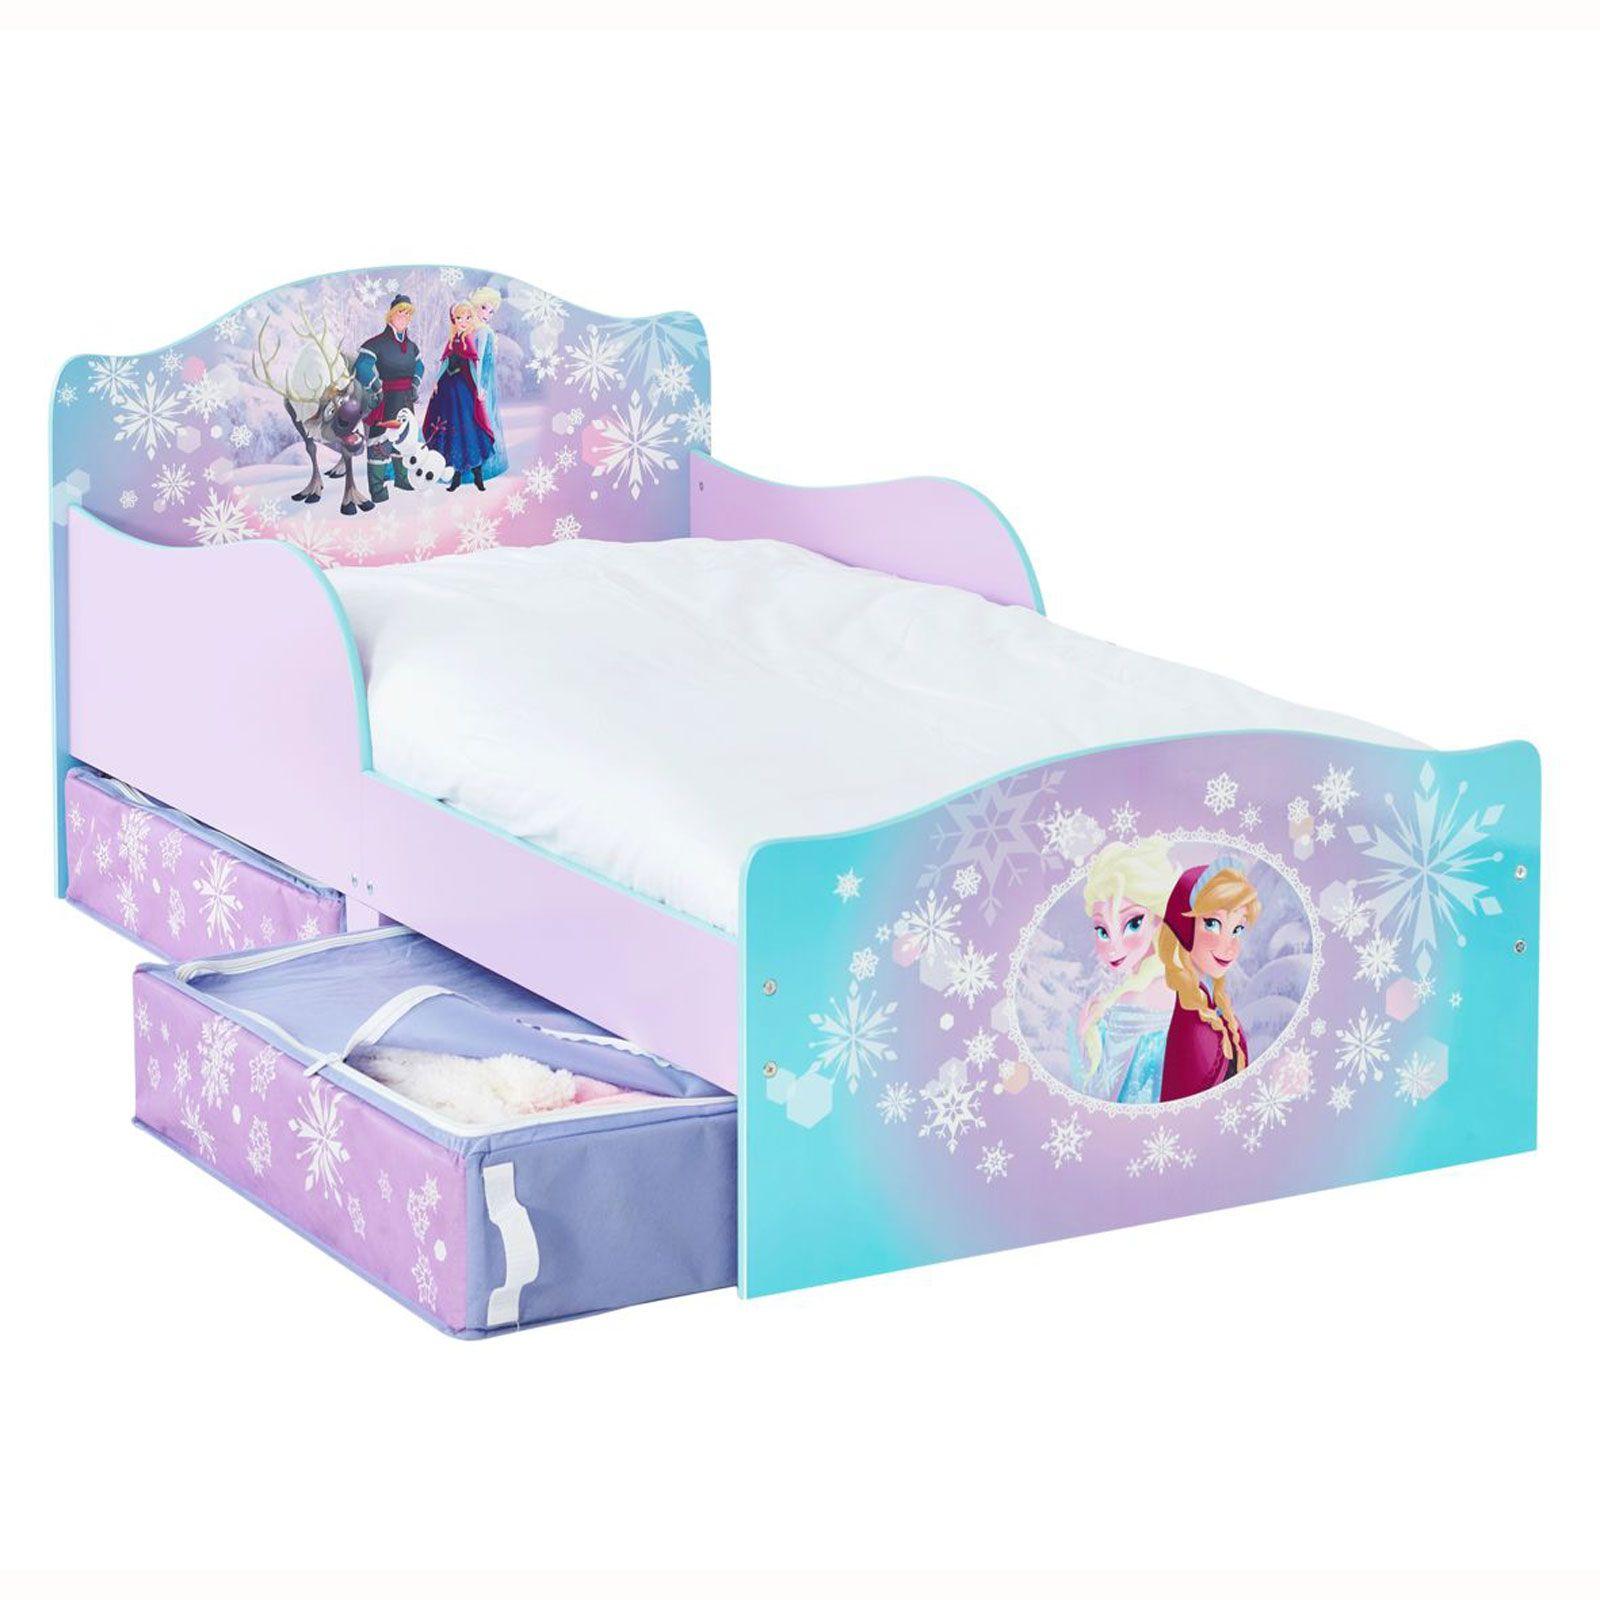 Disney Frozen Mdf Lit Enfant Avec Rangement Matelas Deluxe Neuf Ebay